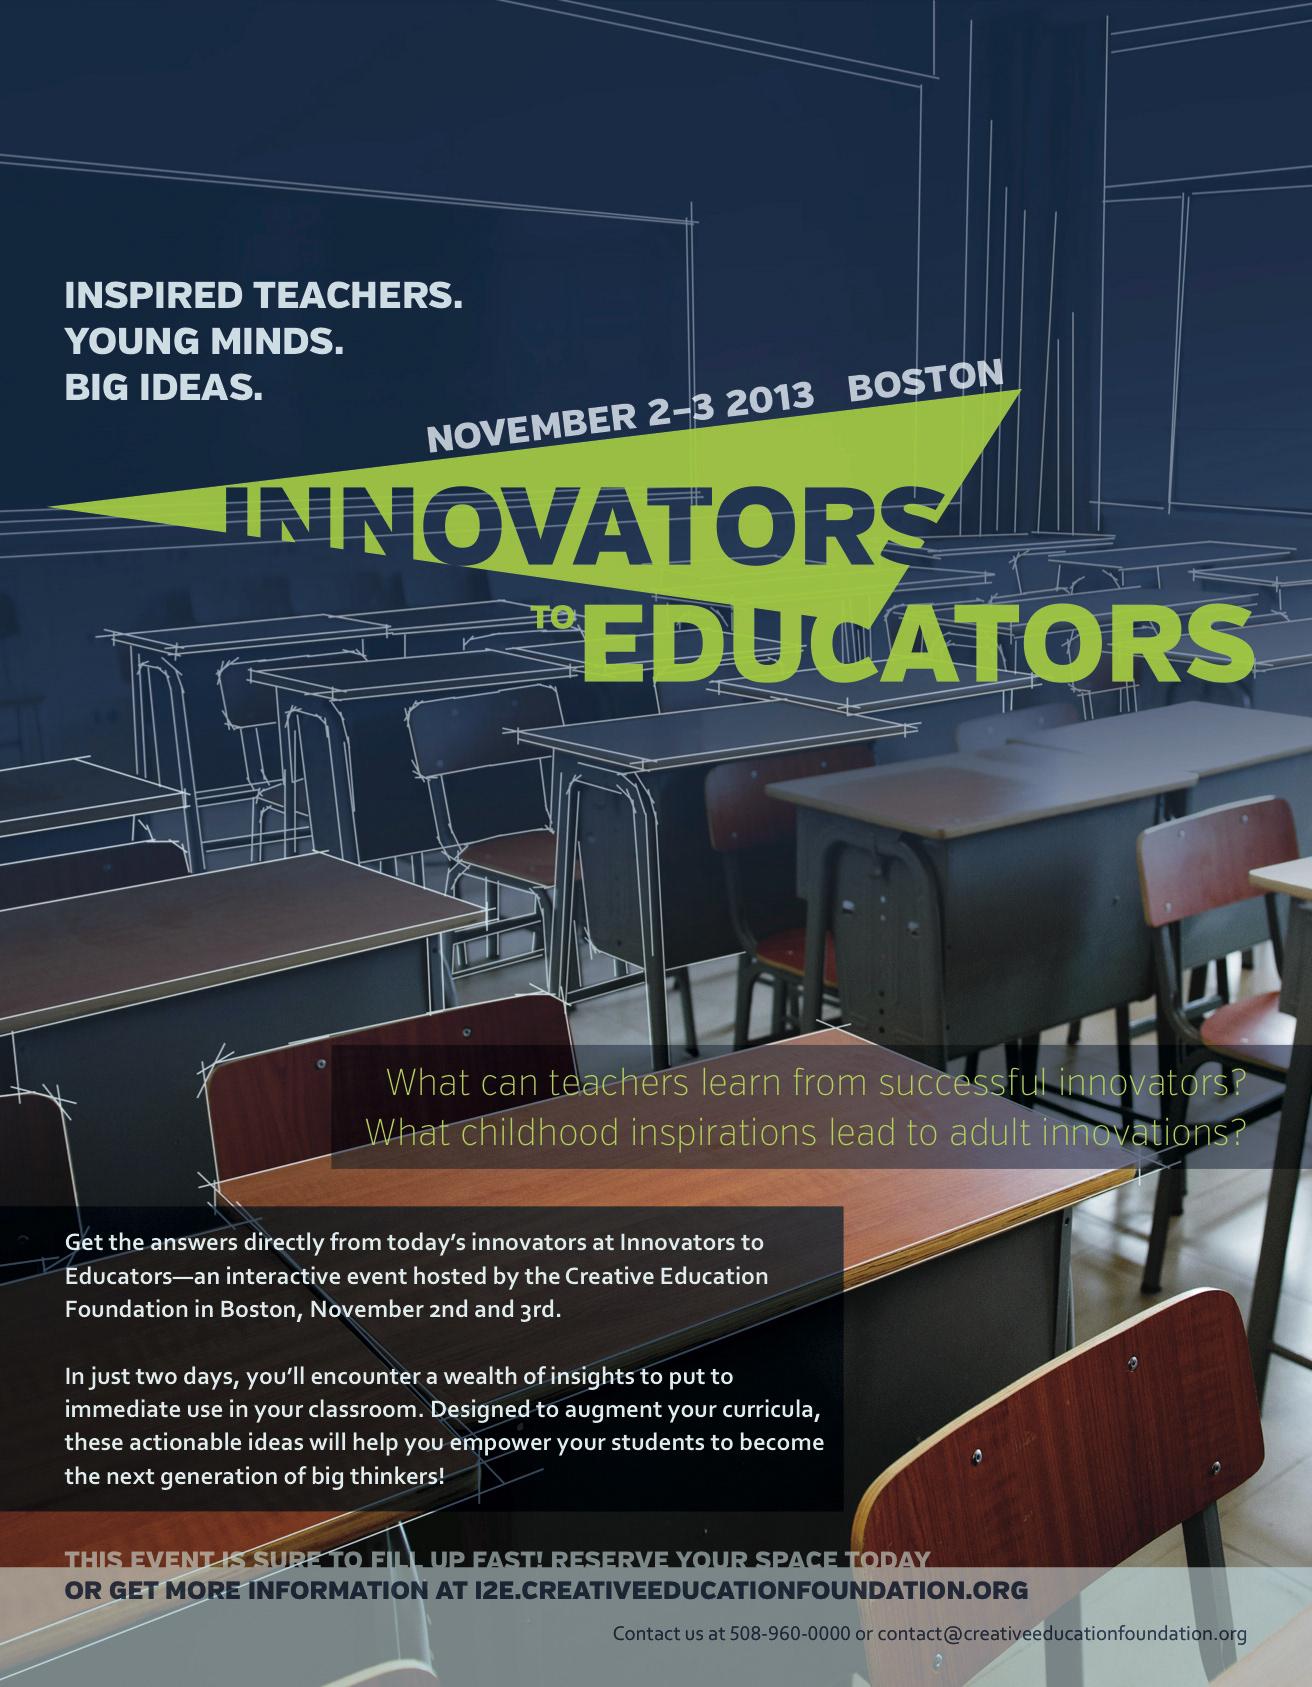 jsh Innovators to Educators Branding Identity